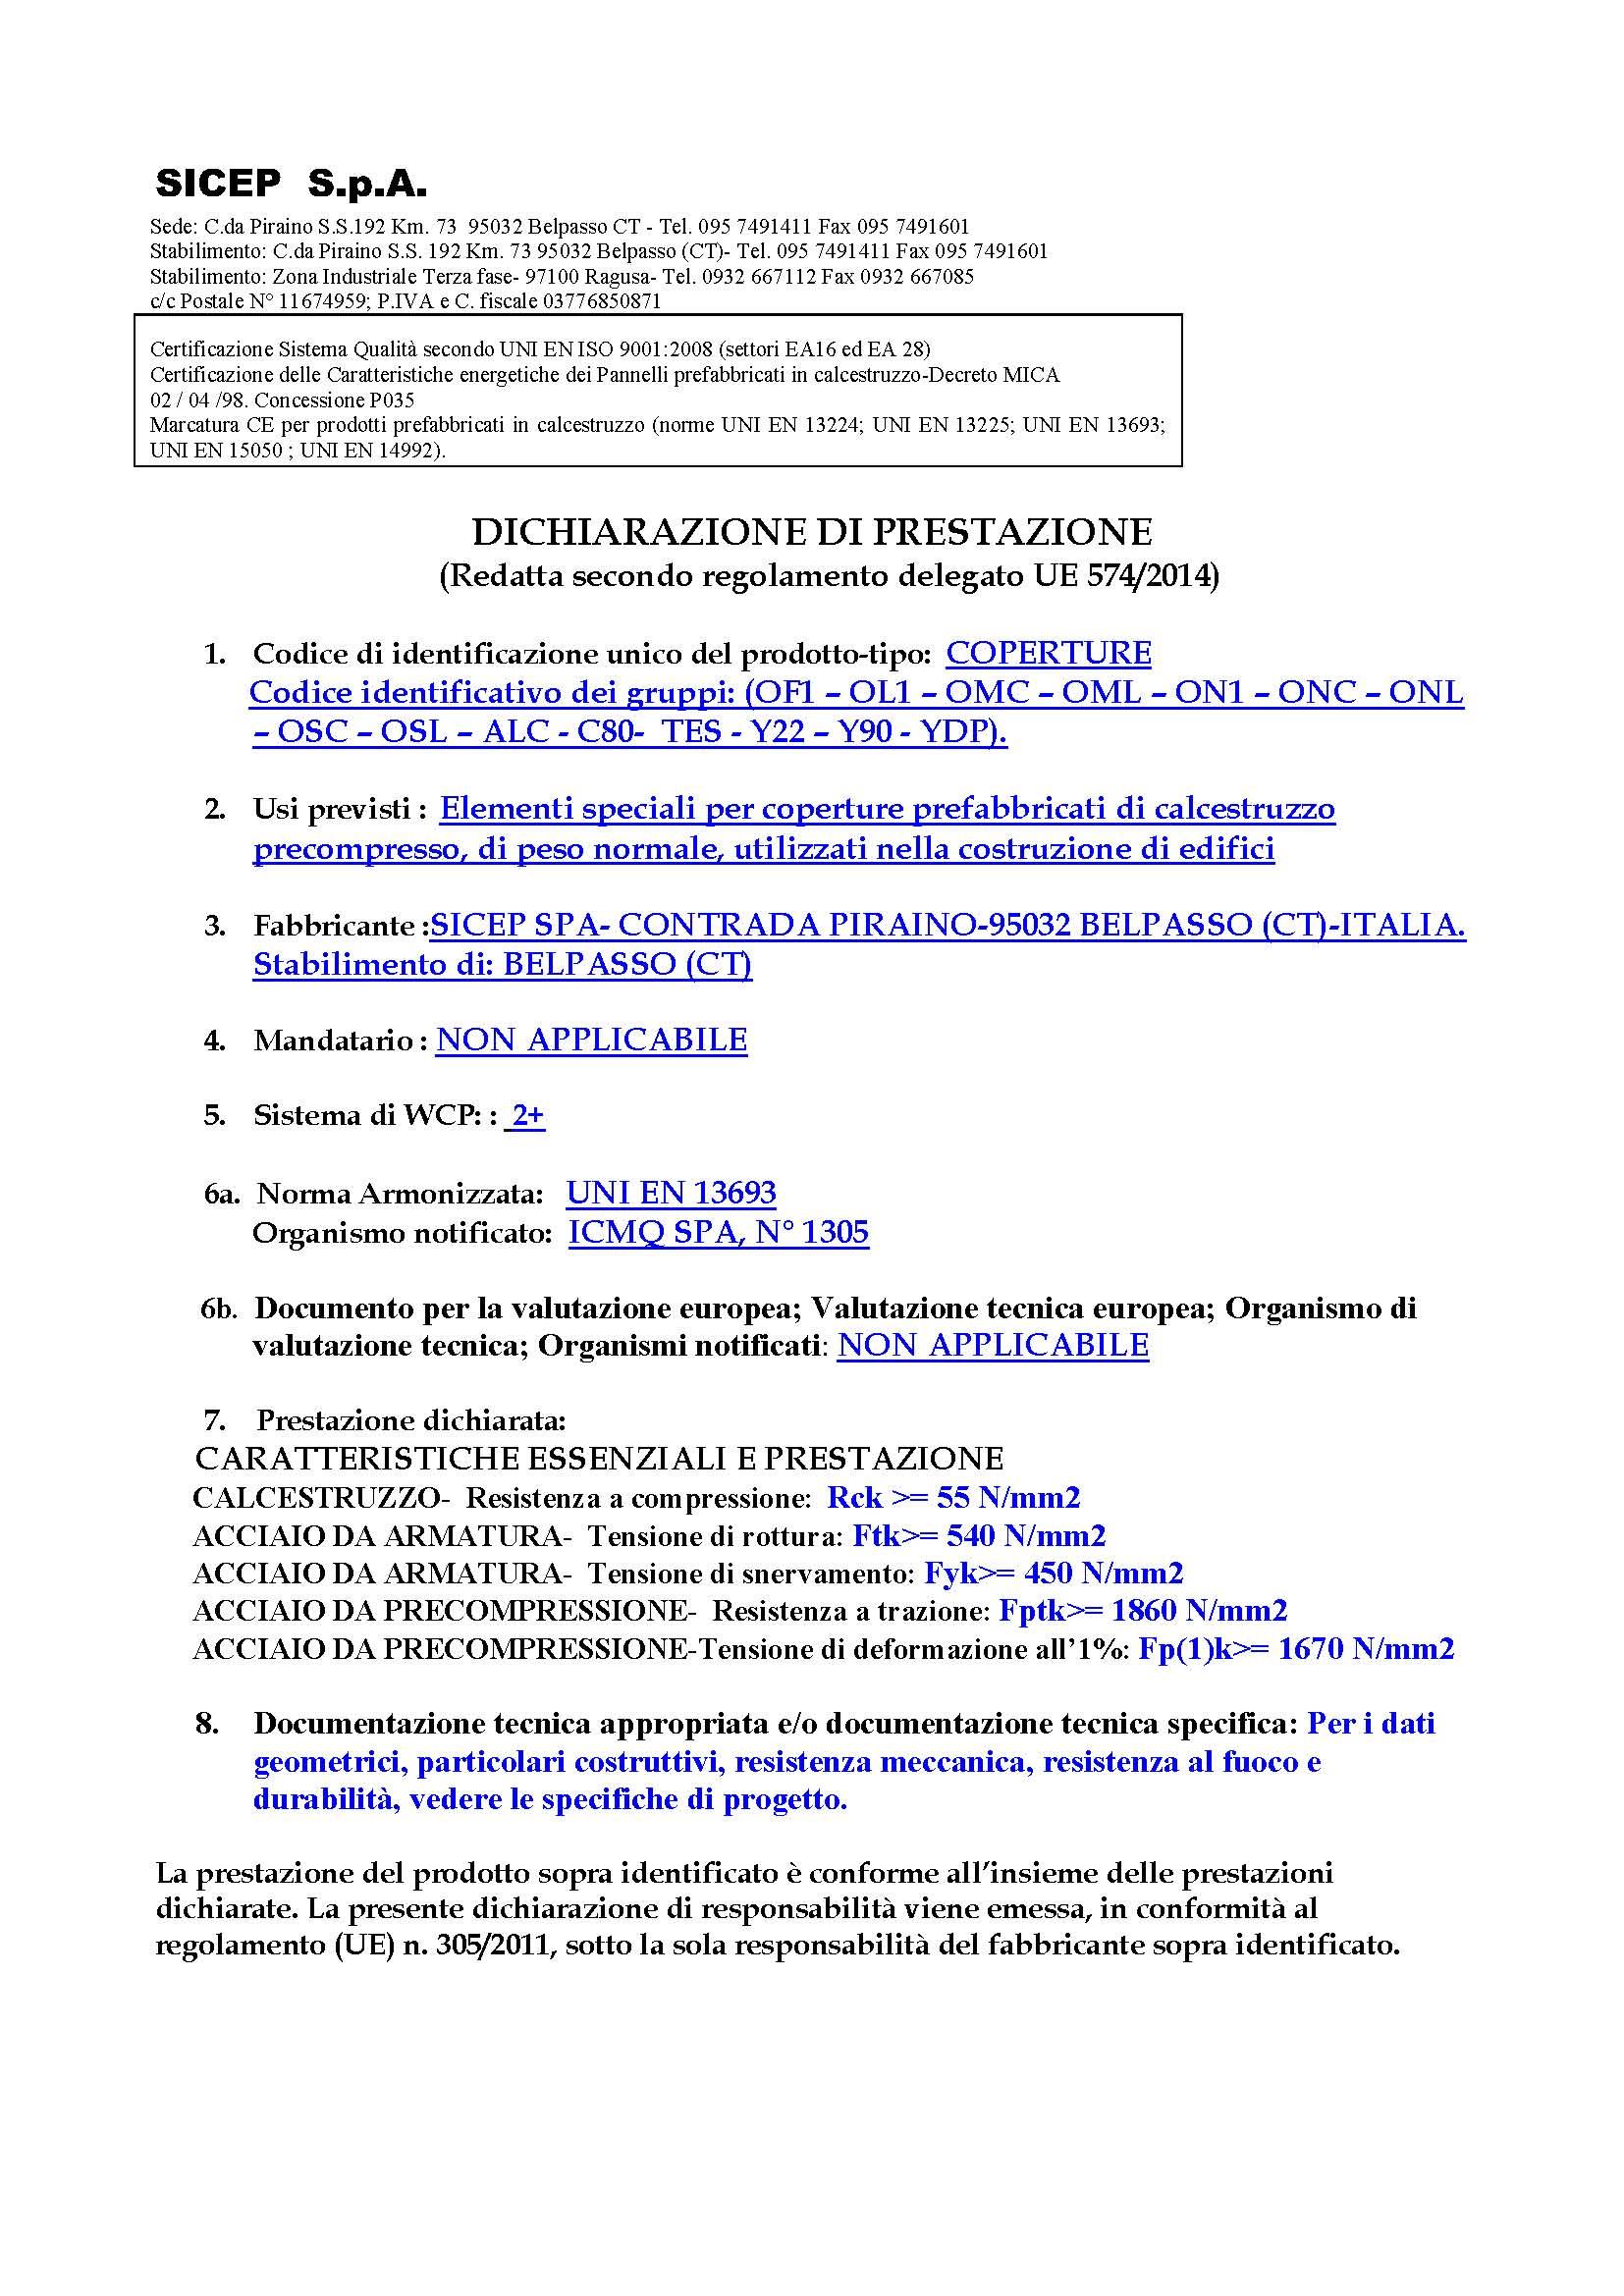 ELEMENTI SPECIALI DI COPERTURA - BELPASSO